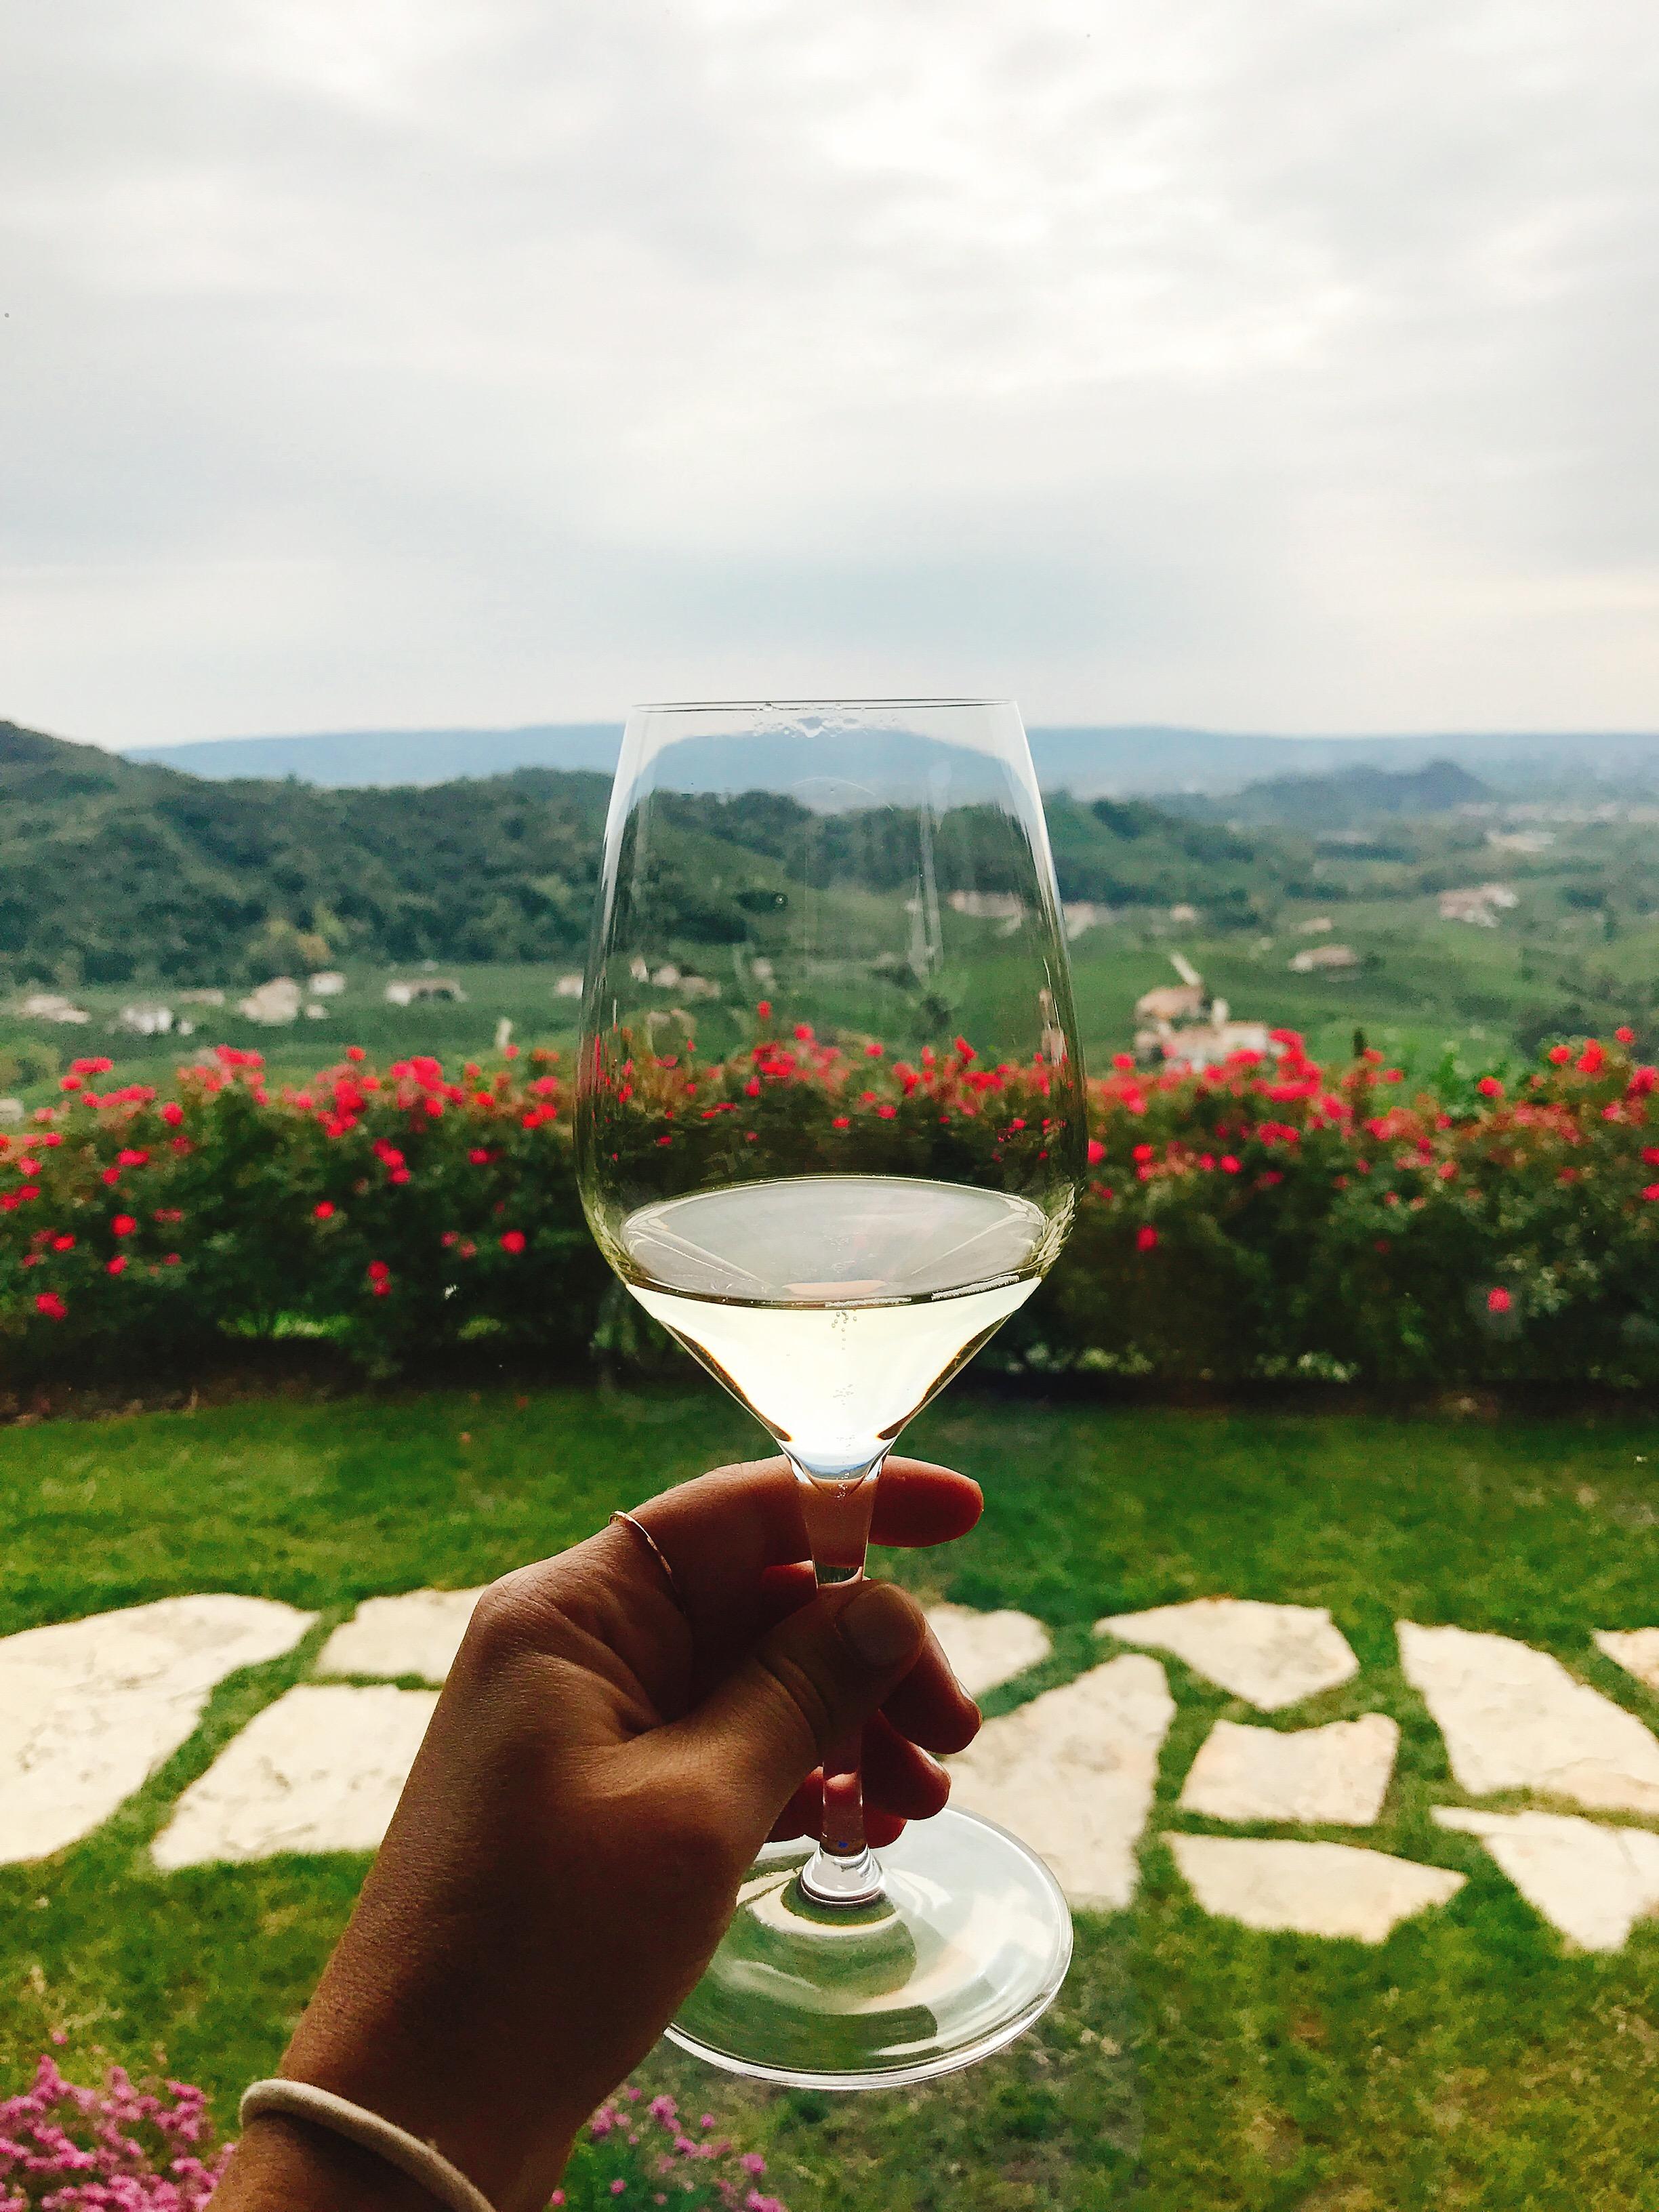 Col Vetoraz: Cheers my friends!